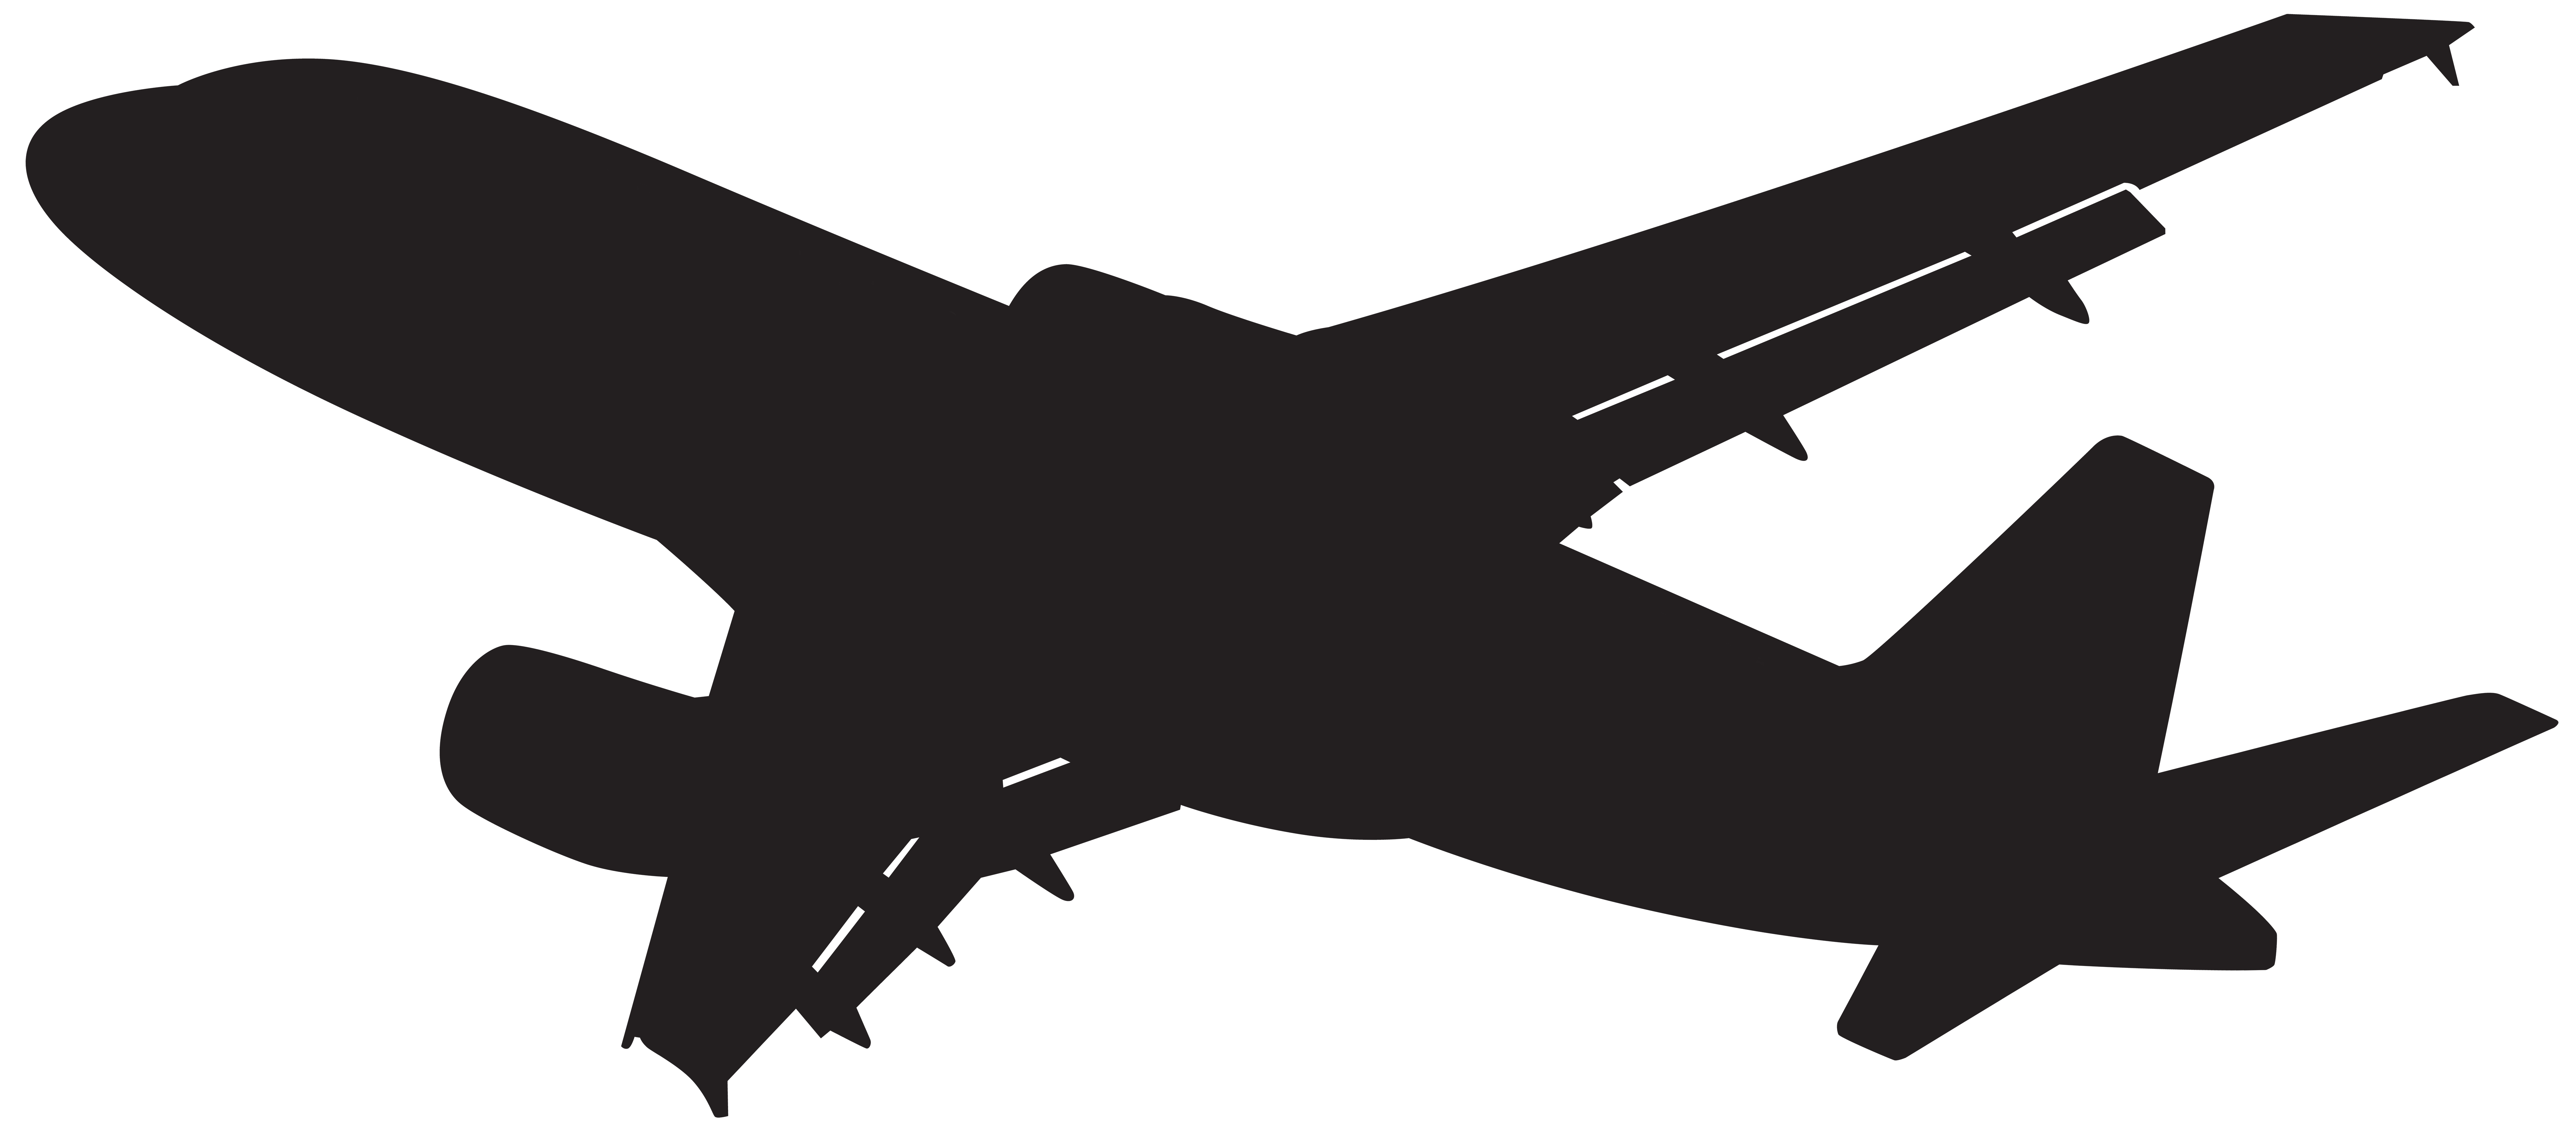 Plane Silhouette PNG Clip Art.